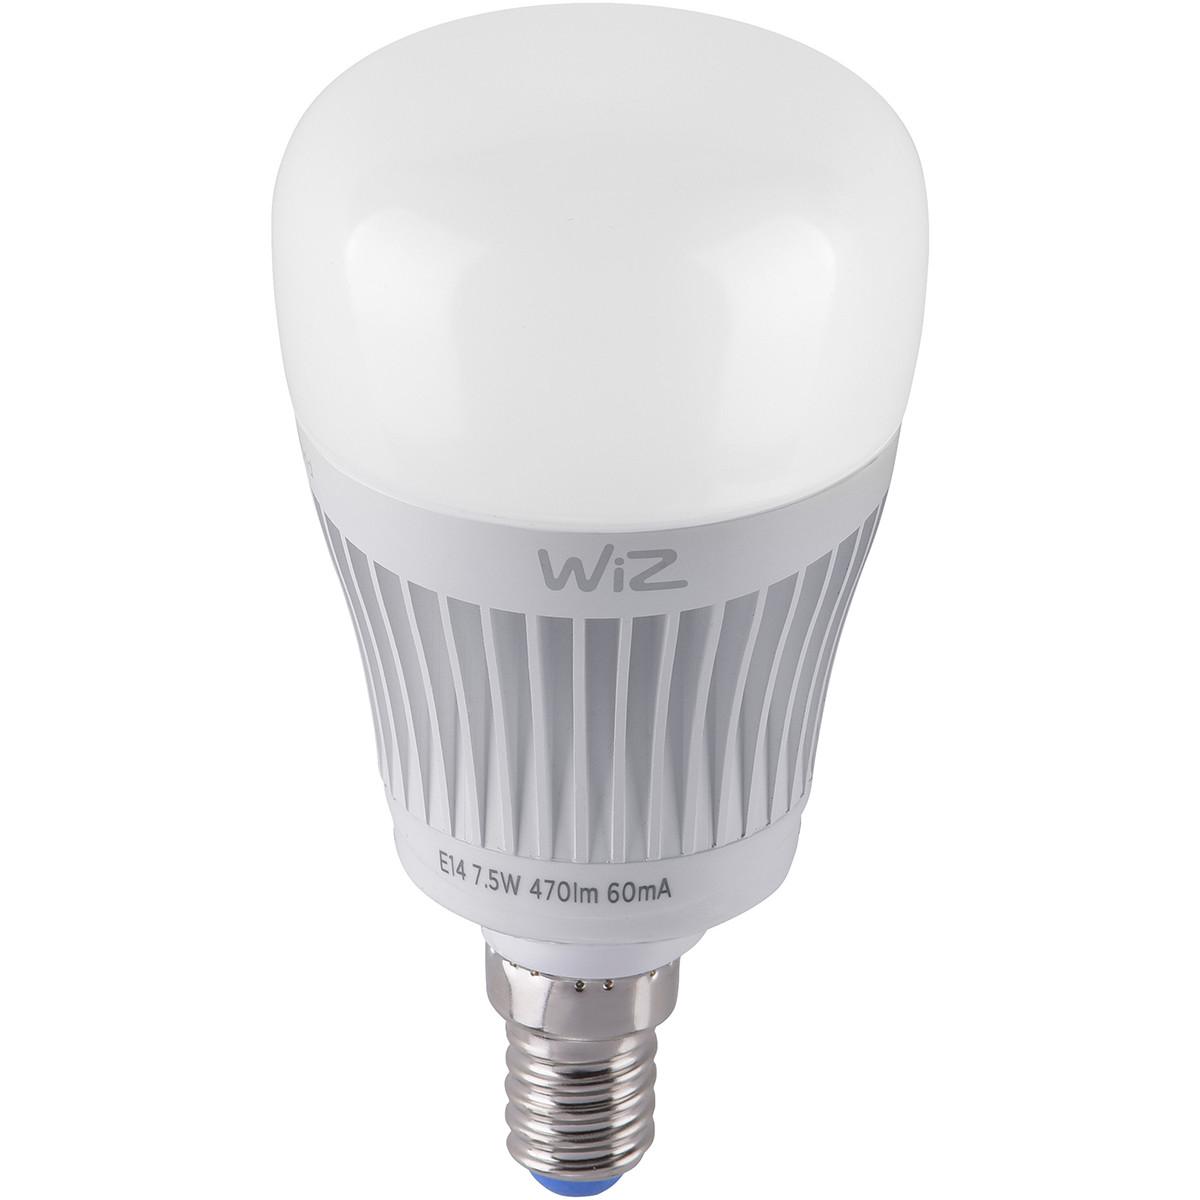 LED Lamp WiZ - Smart LED - Trion Akusti - E14 Fitting - 7W - Slimme LED - Dimbaa